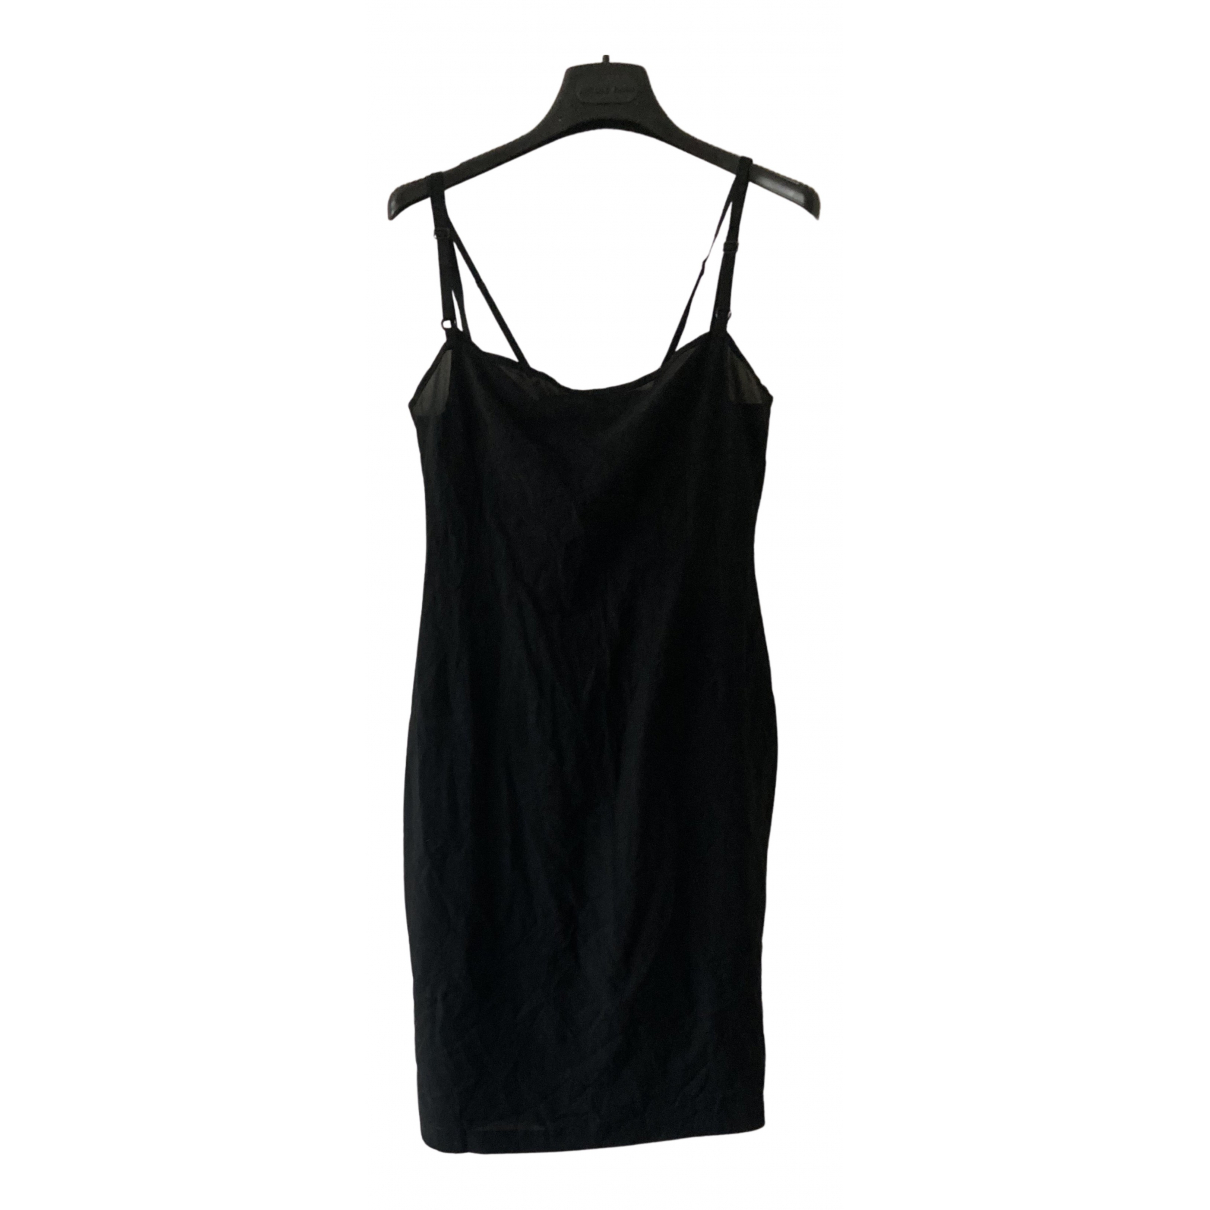 D&g \N Kleid in  Schwarz Seide